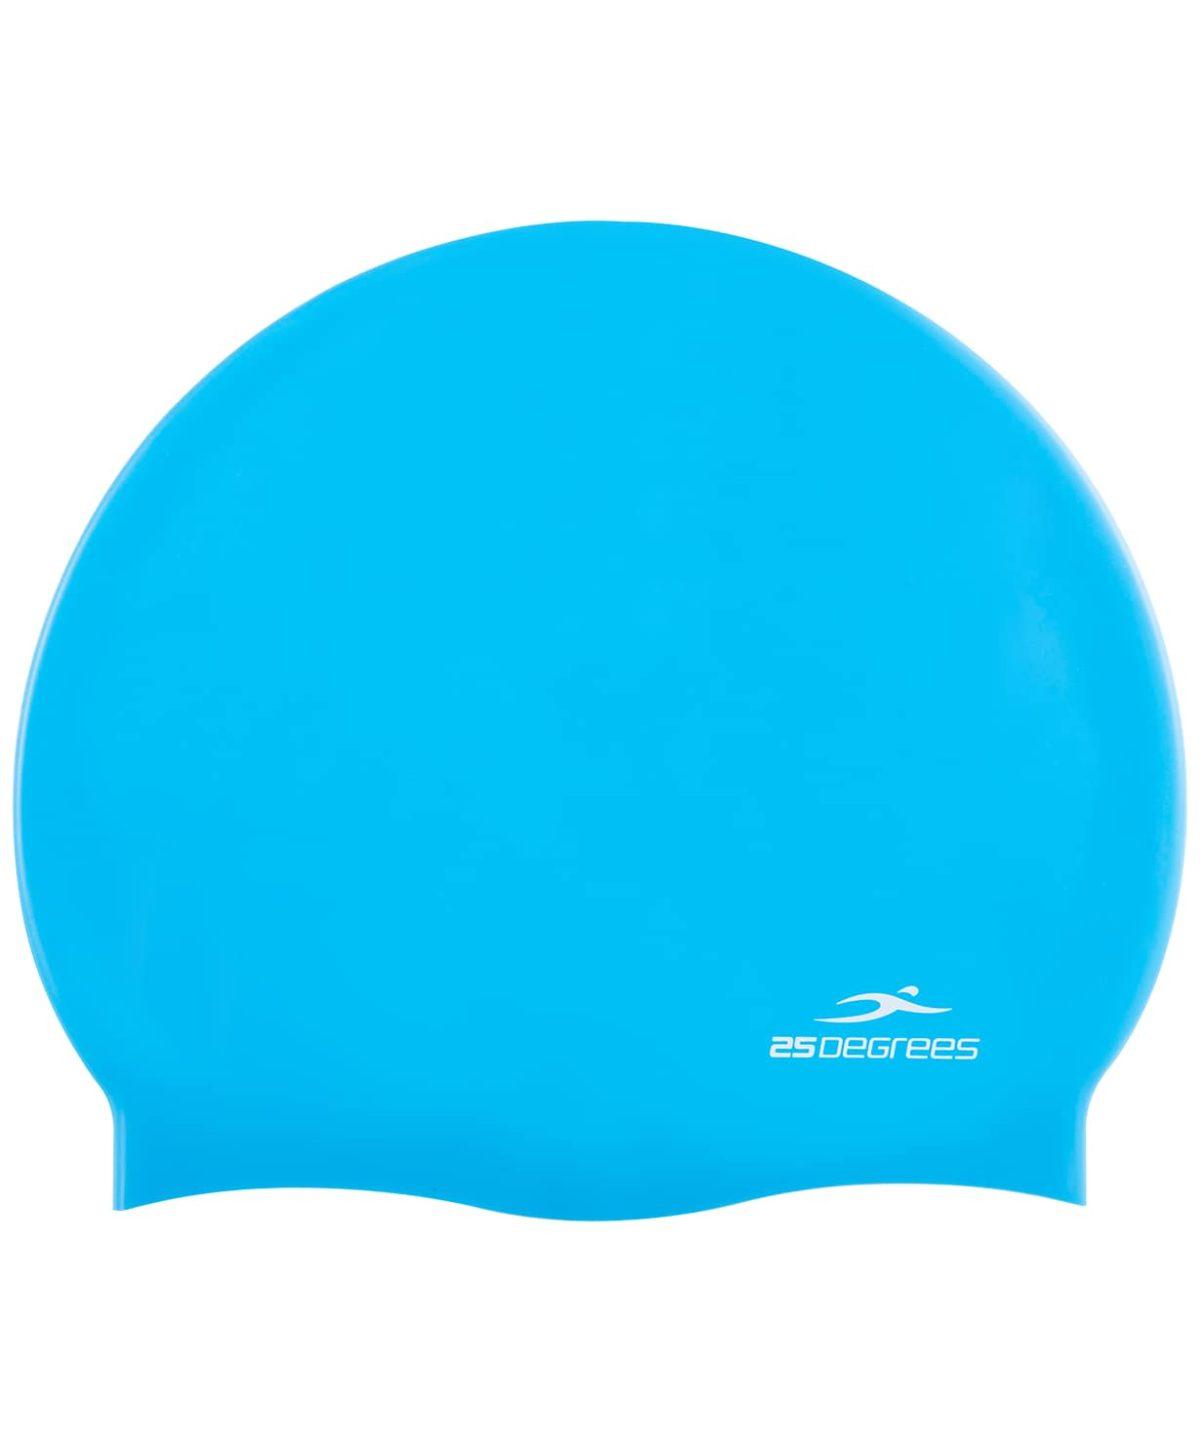 25DEGREES Шапочка для плавания Nuance, силикон 25D15-NU-20-30: голубой - 1